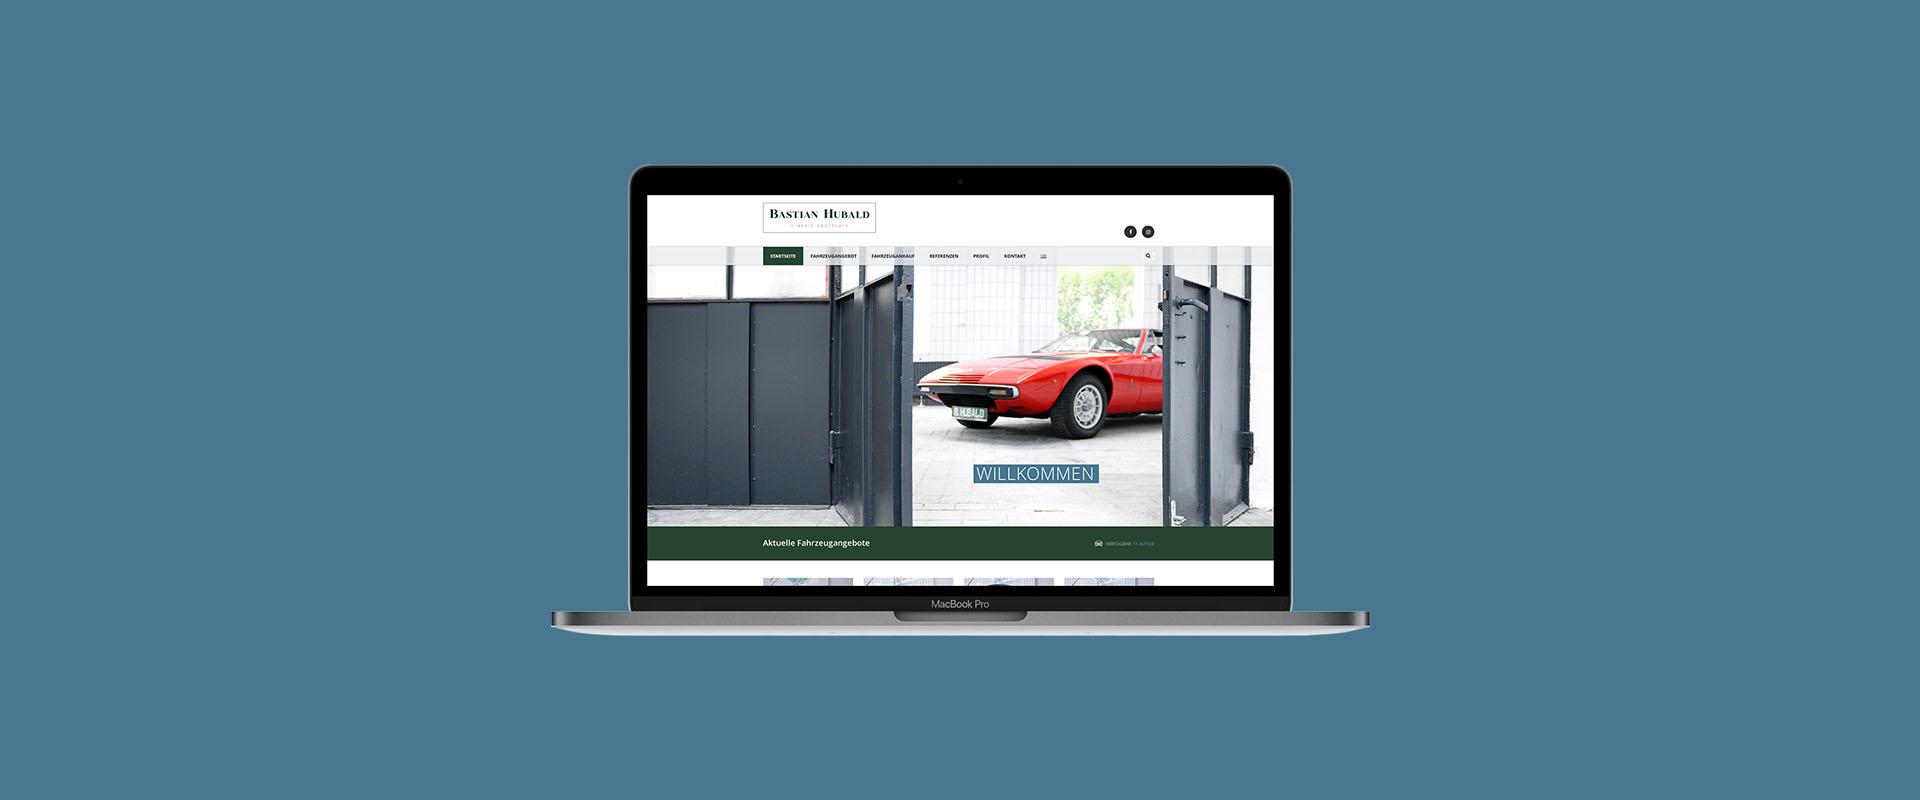 Bastain Hubald Mockup Webseite